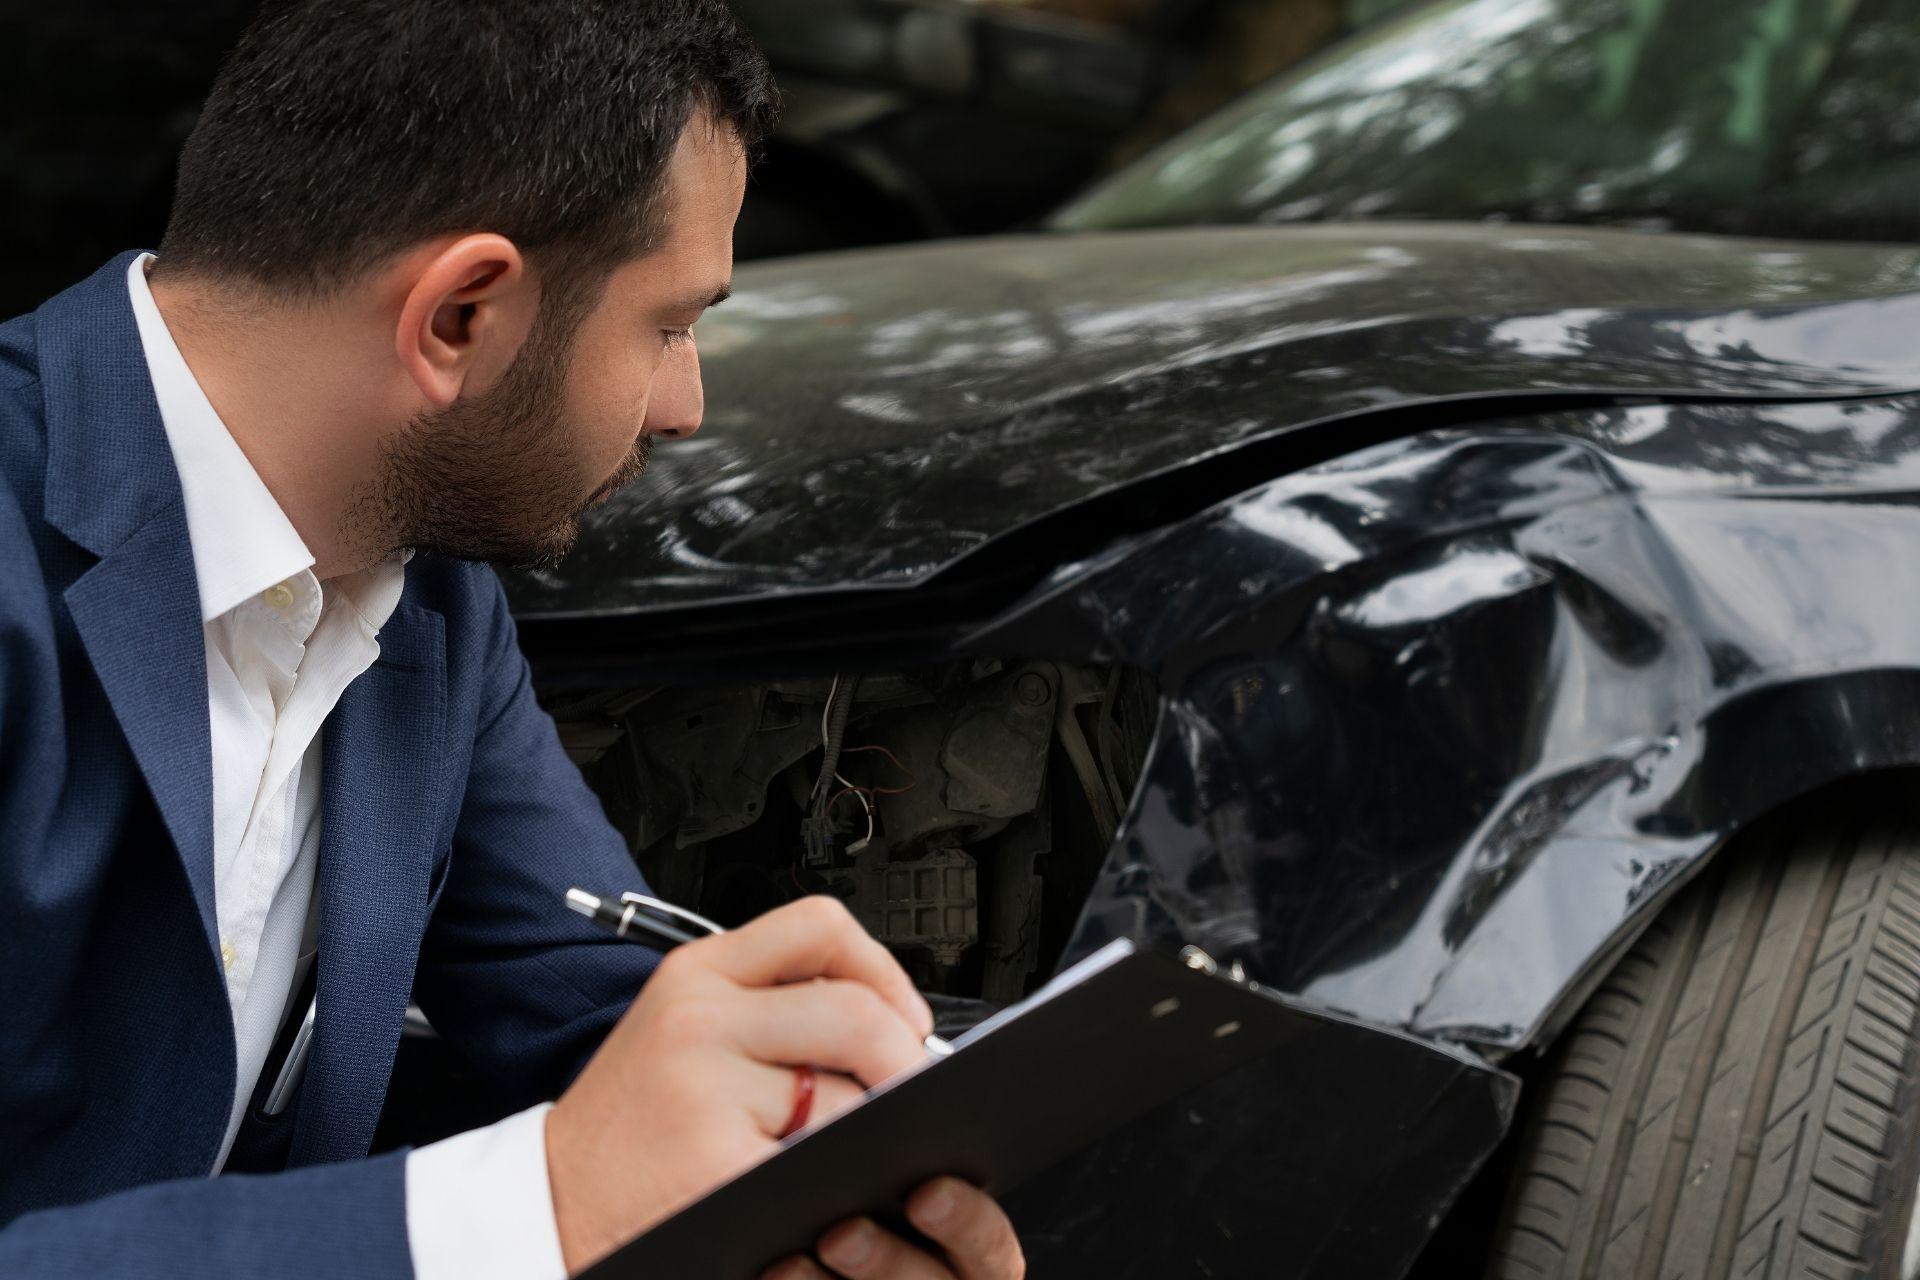 guy checking on black car